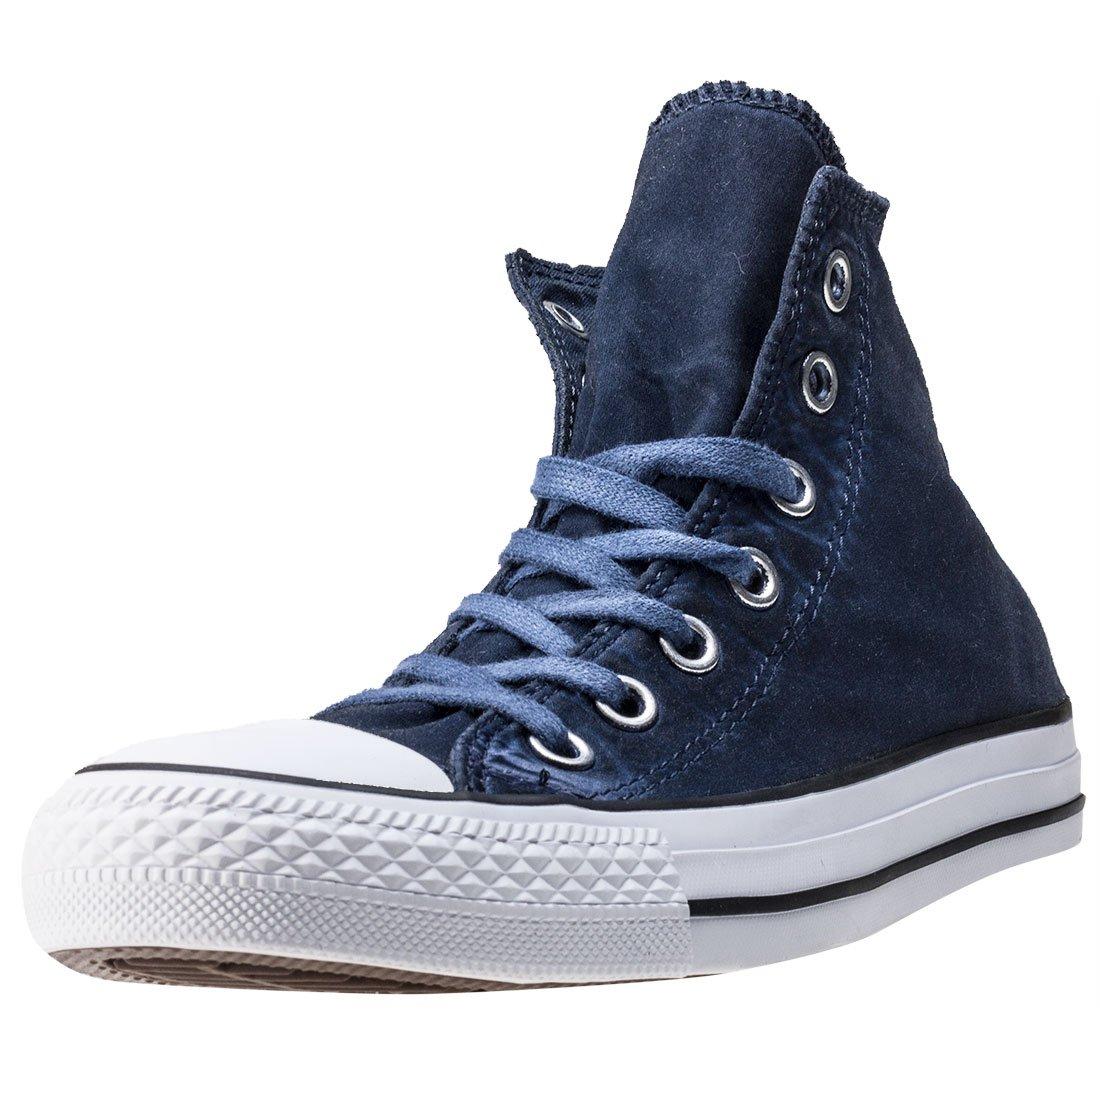 Converse Womens Chuck Taylor All Star Hi Top Textile Trainers 35.5 EU|Obsidian